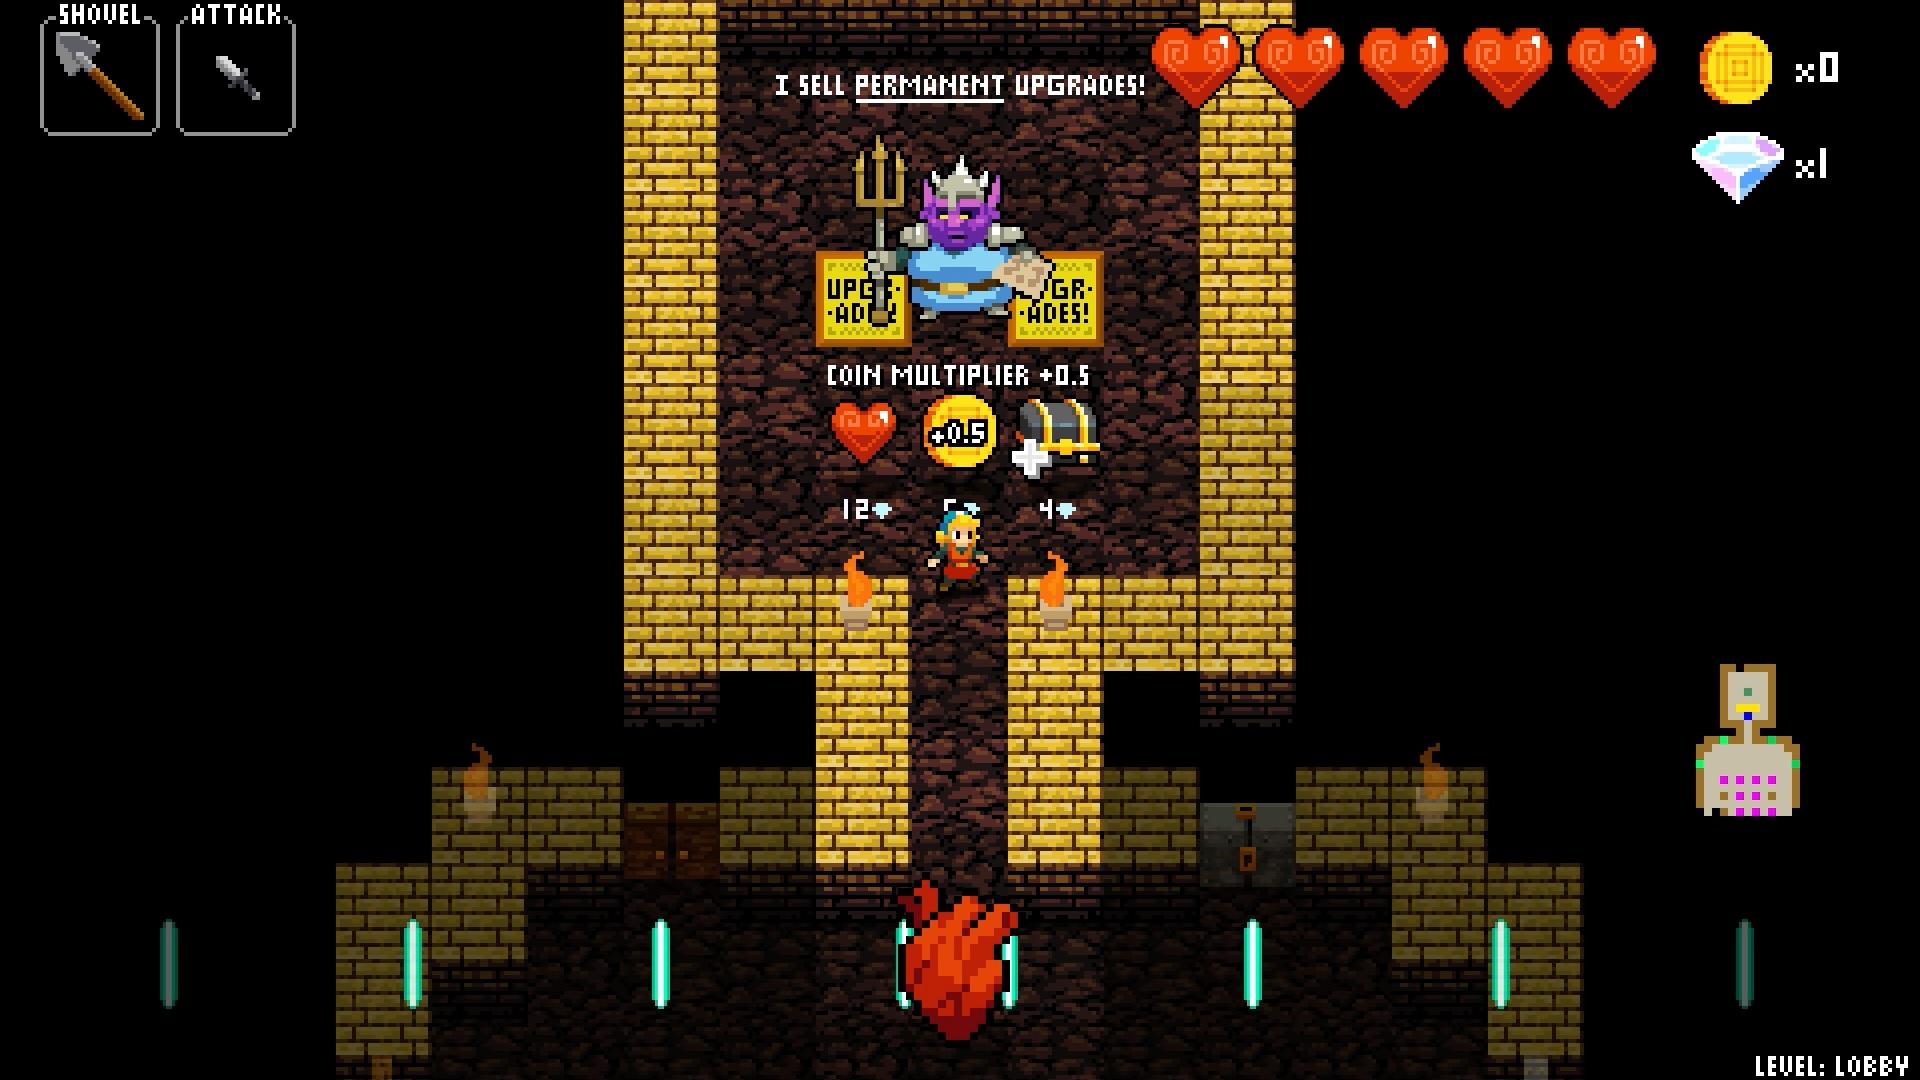 Crypt of the NecroDancer review dragon